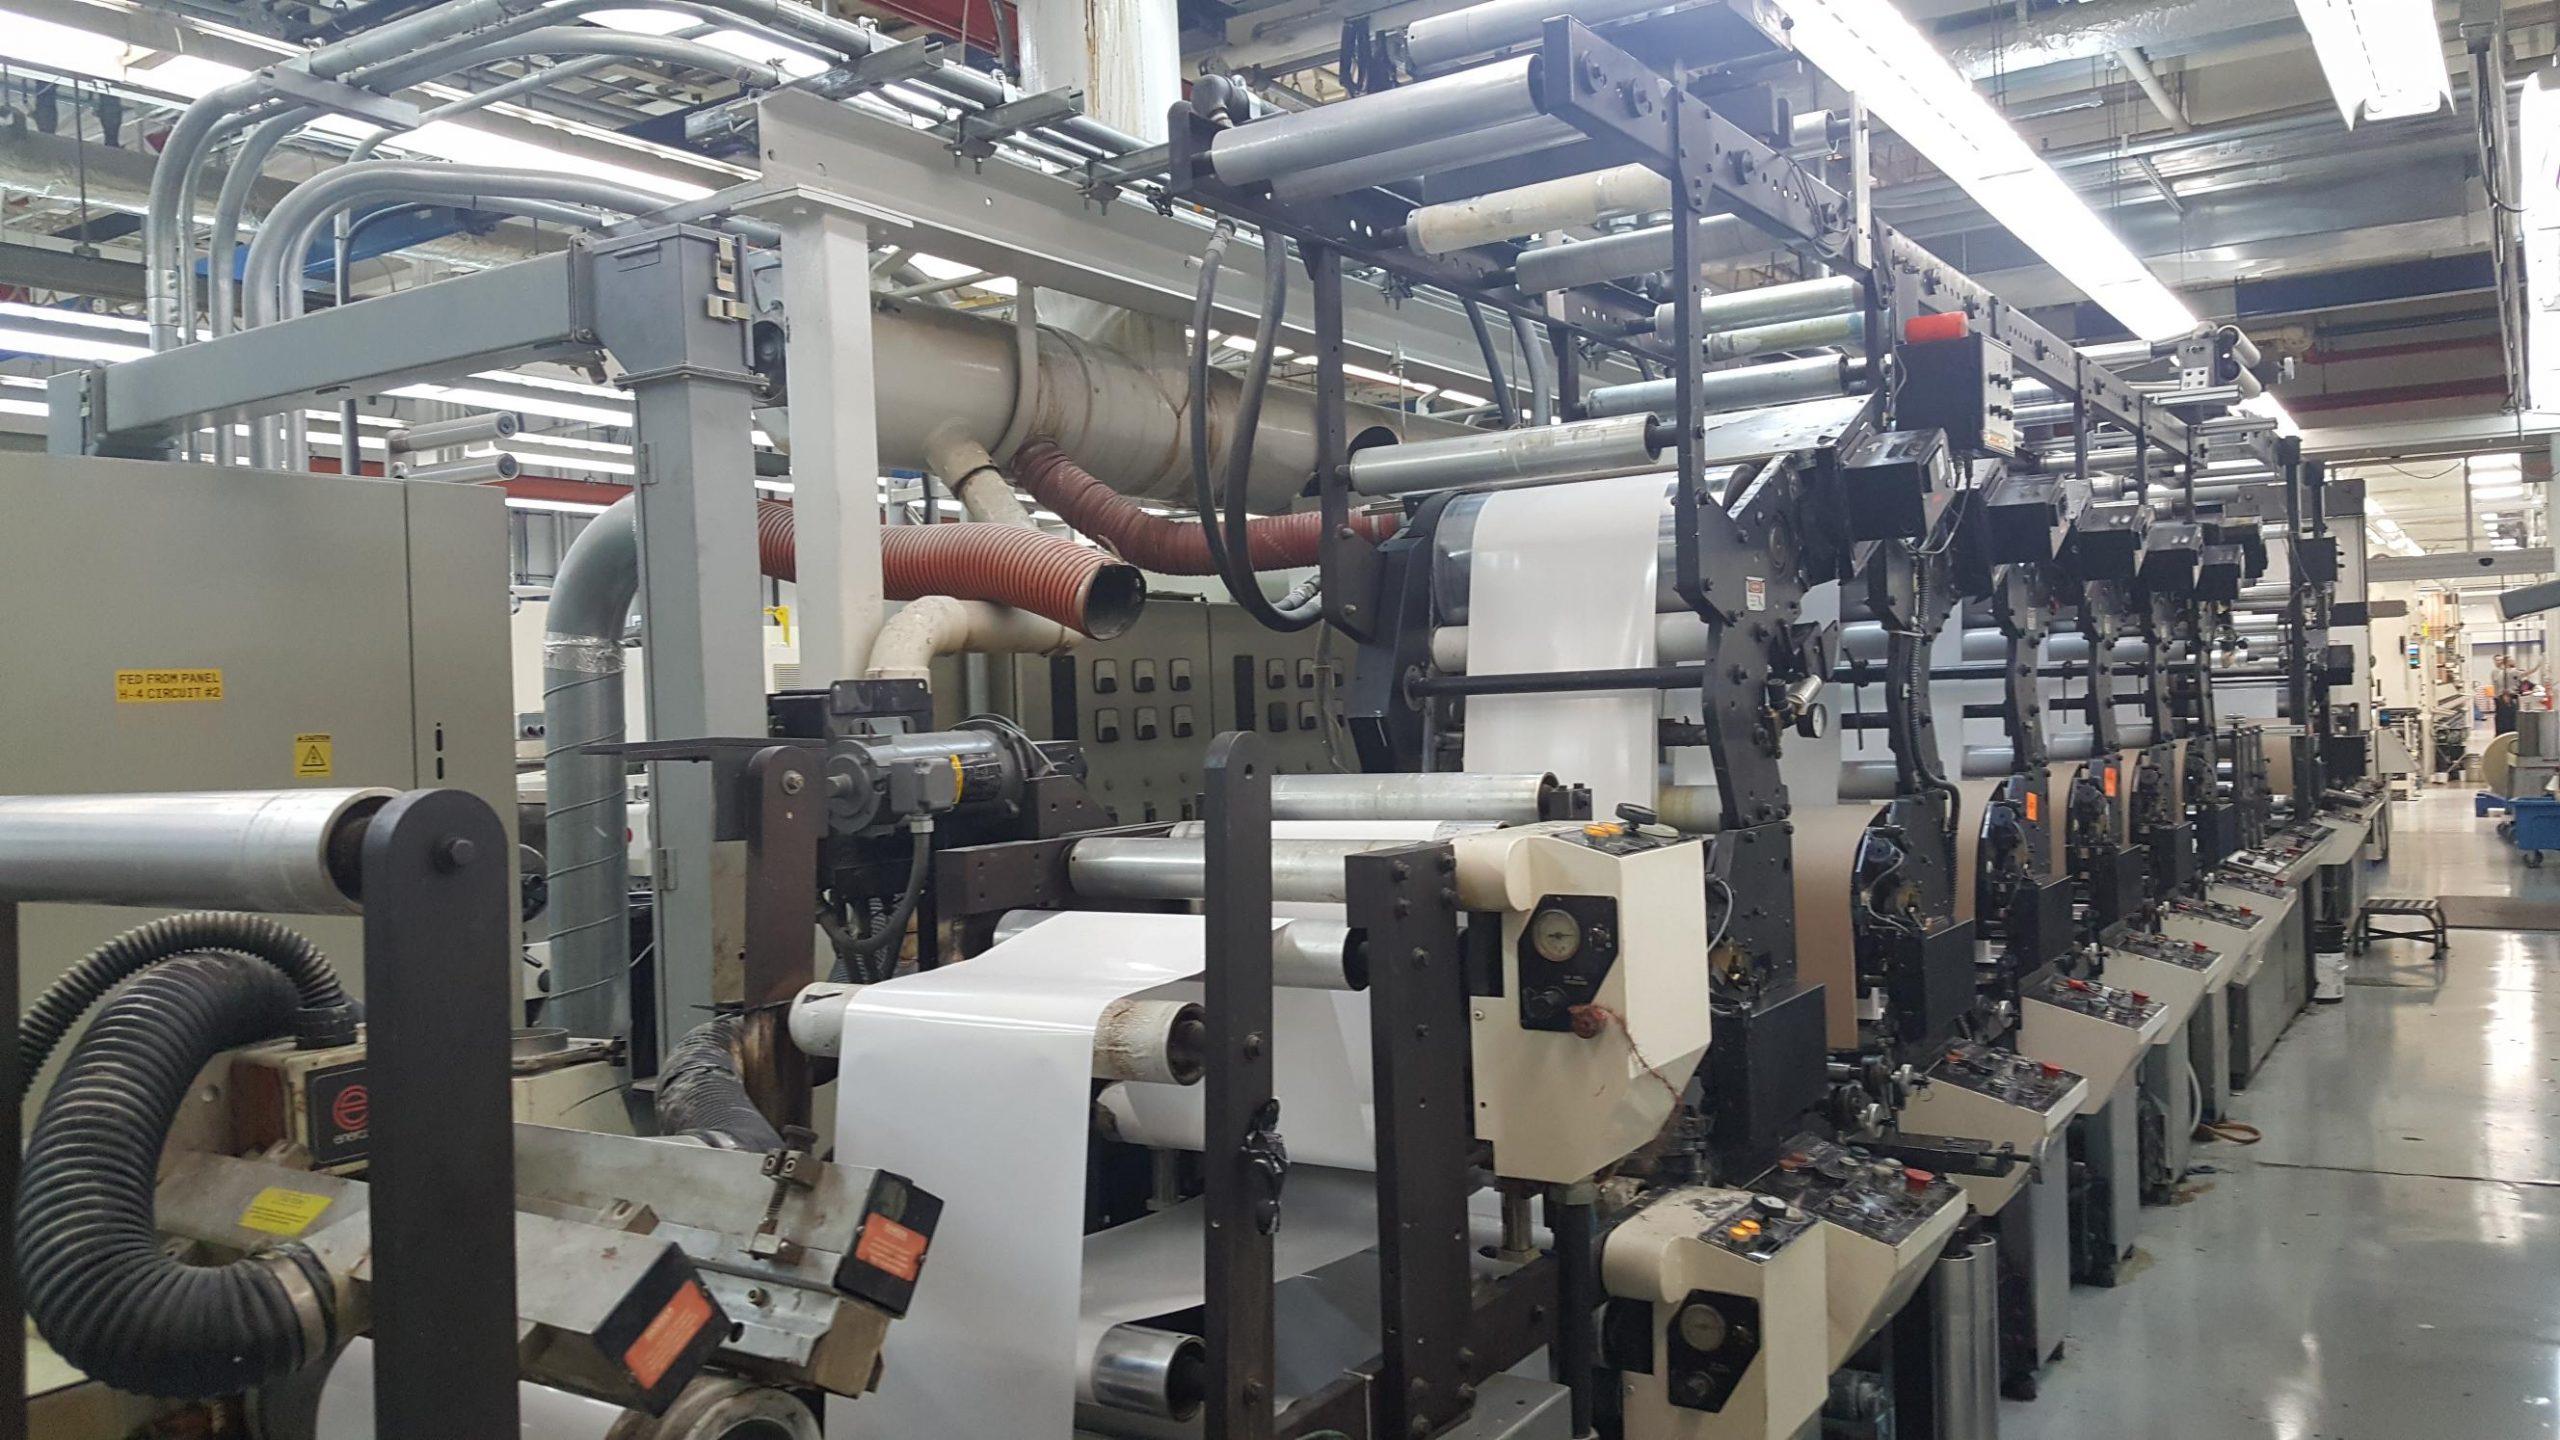 Comco ProGlide - Used Flexo Printing Presses and Used Flexographic Equipment-8